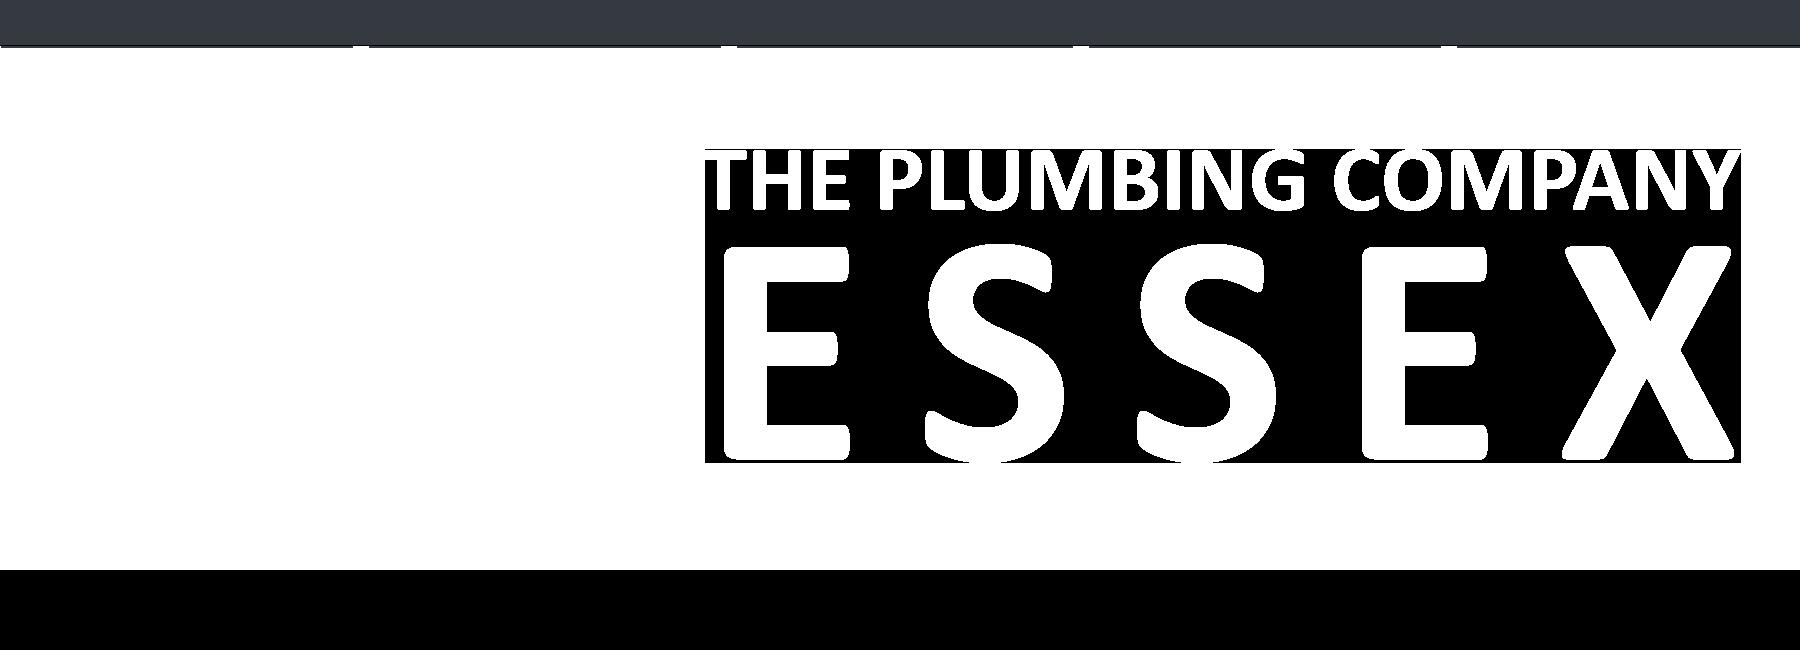 The Plumbing Company Essex